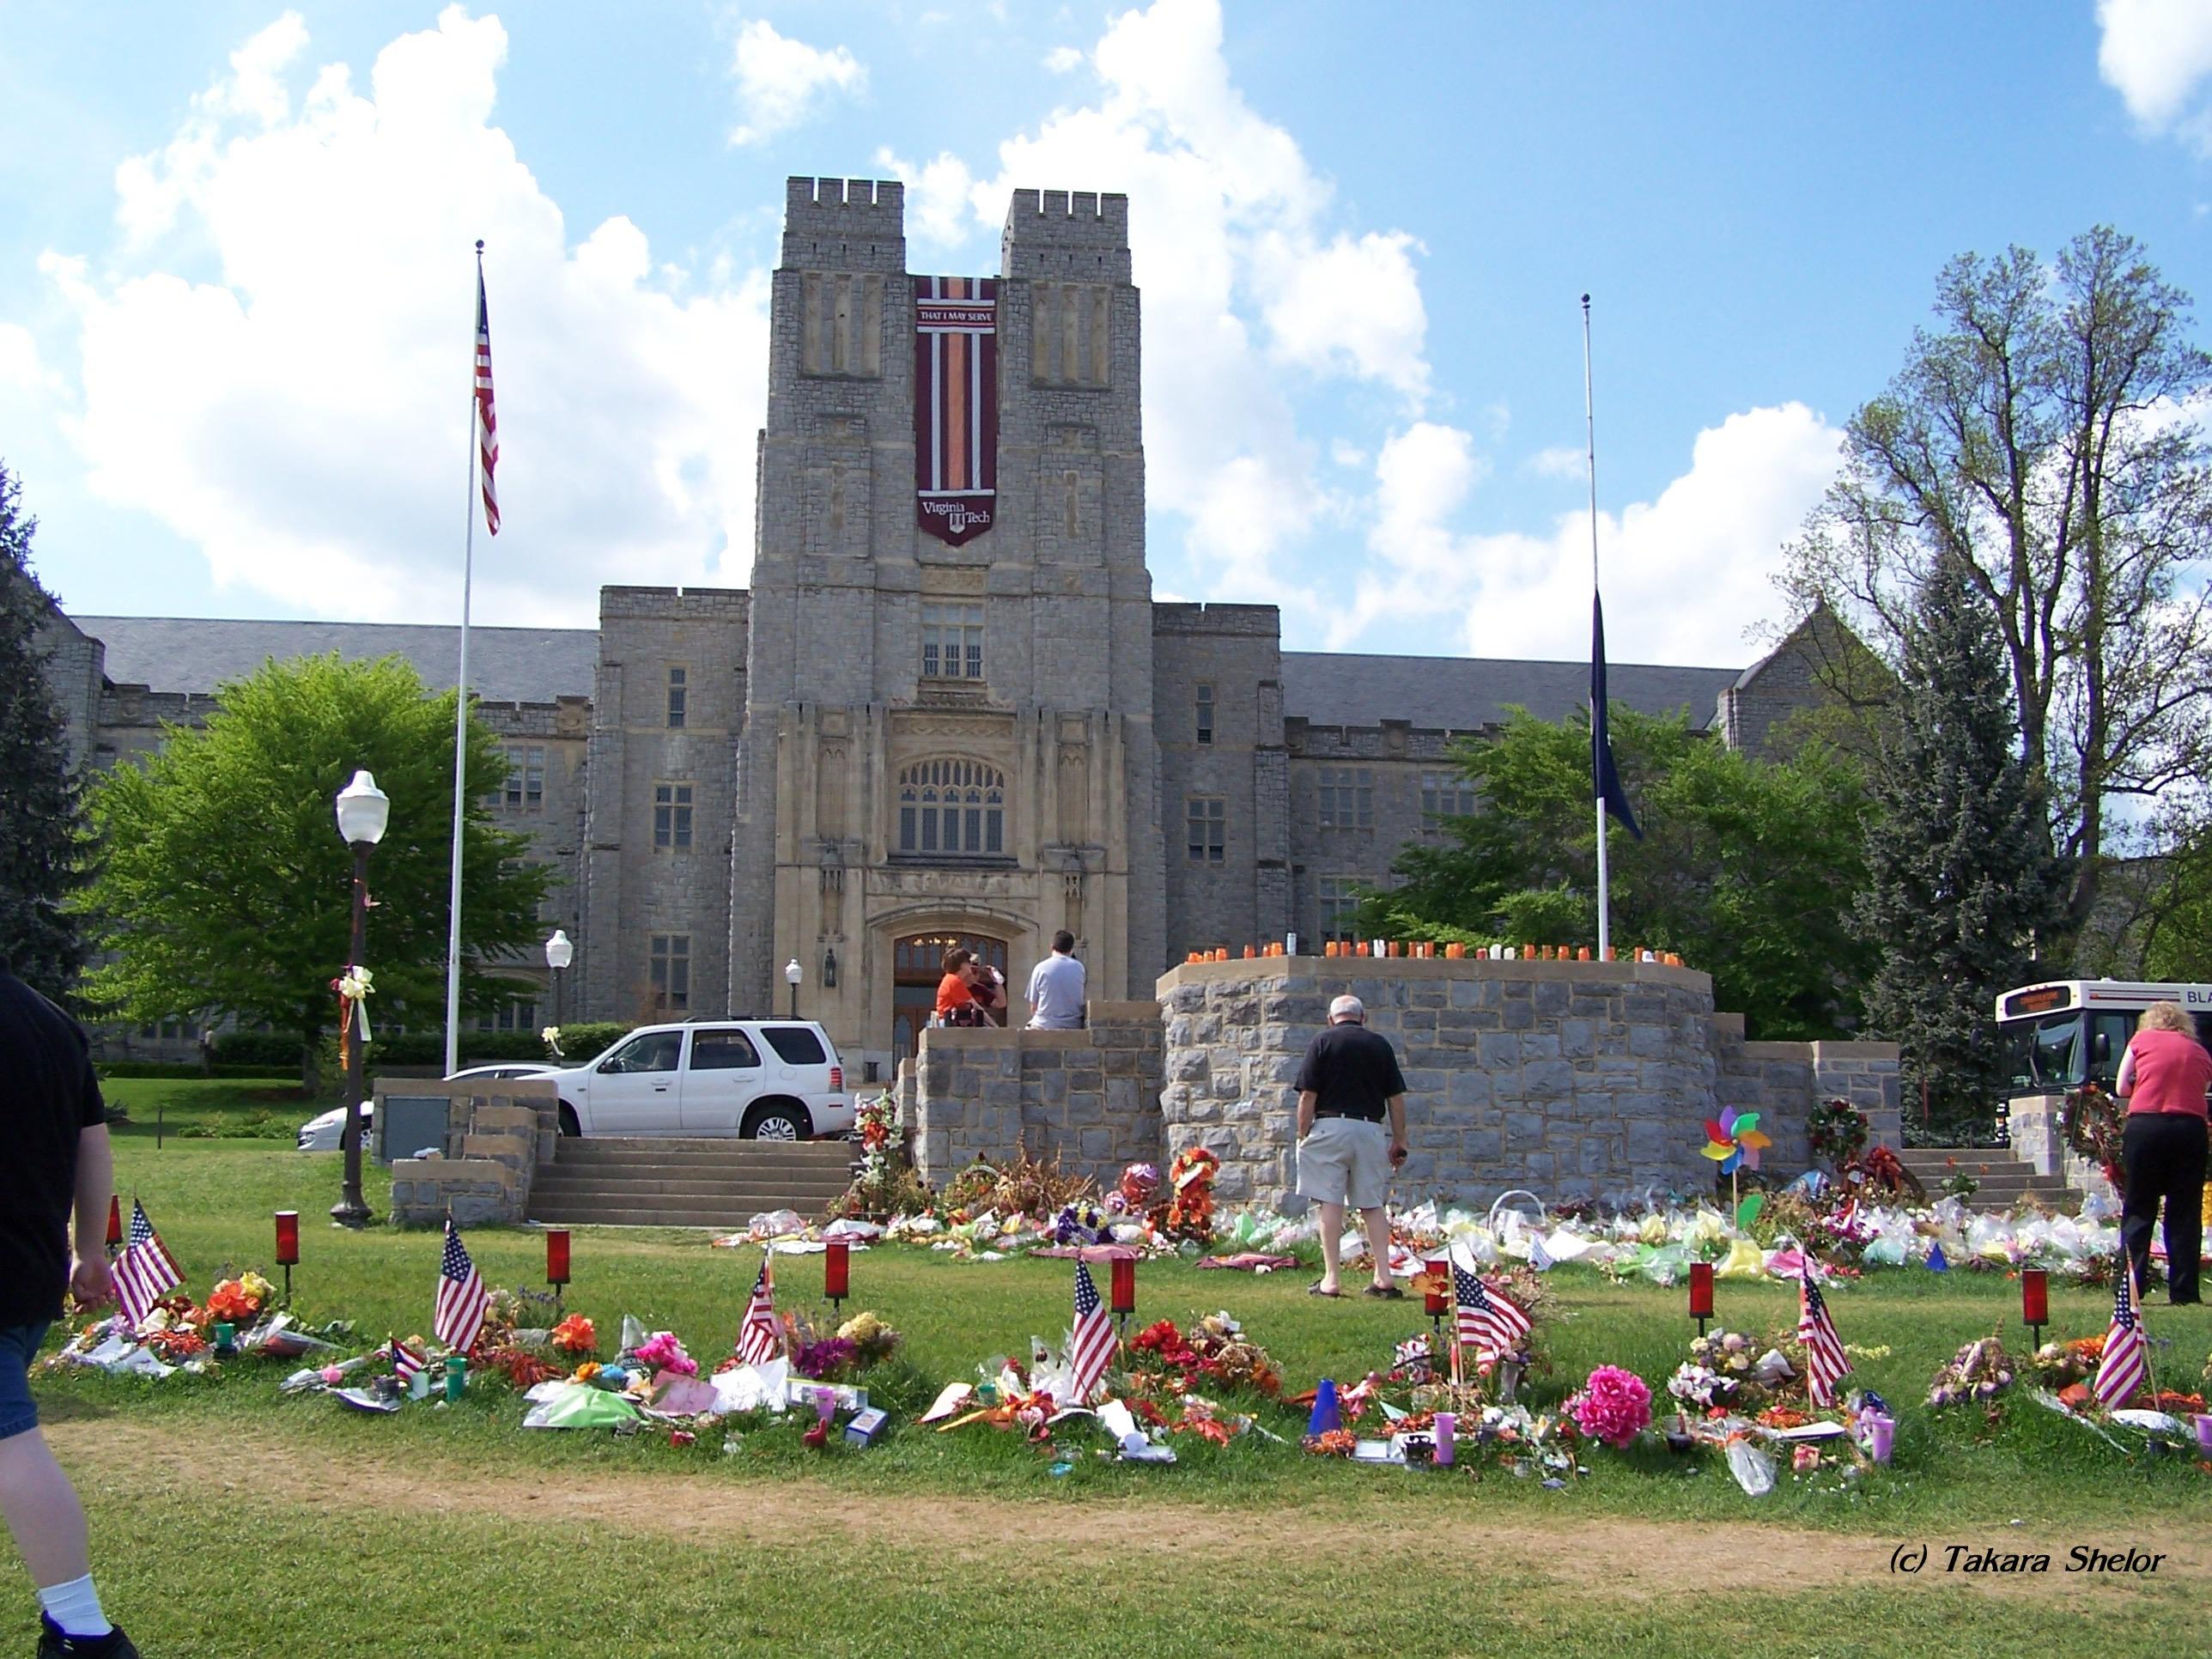 Virginia Tech Massacre Memorial by Takara